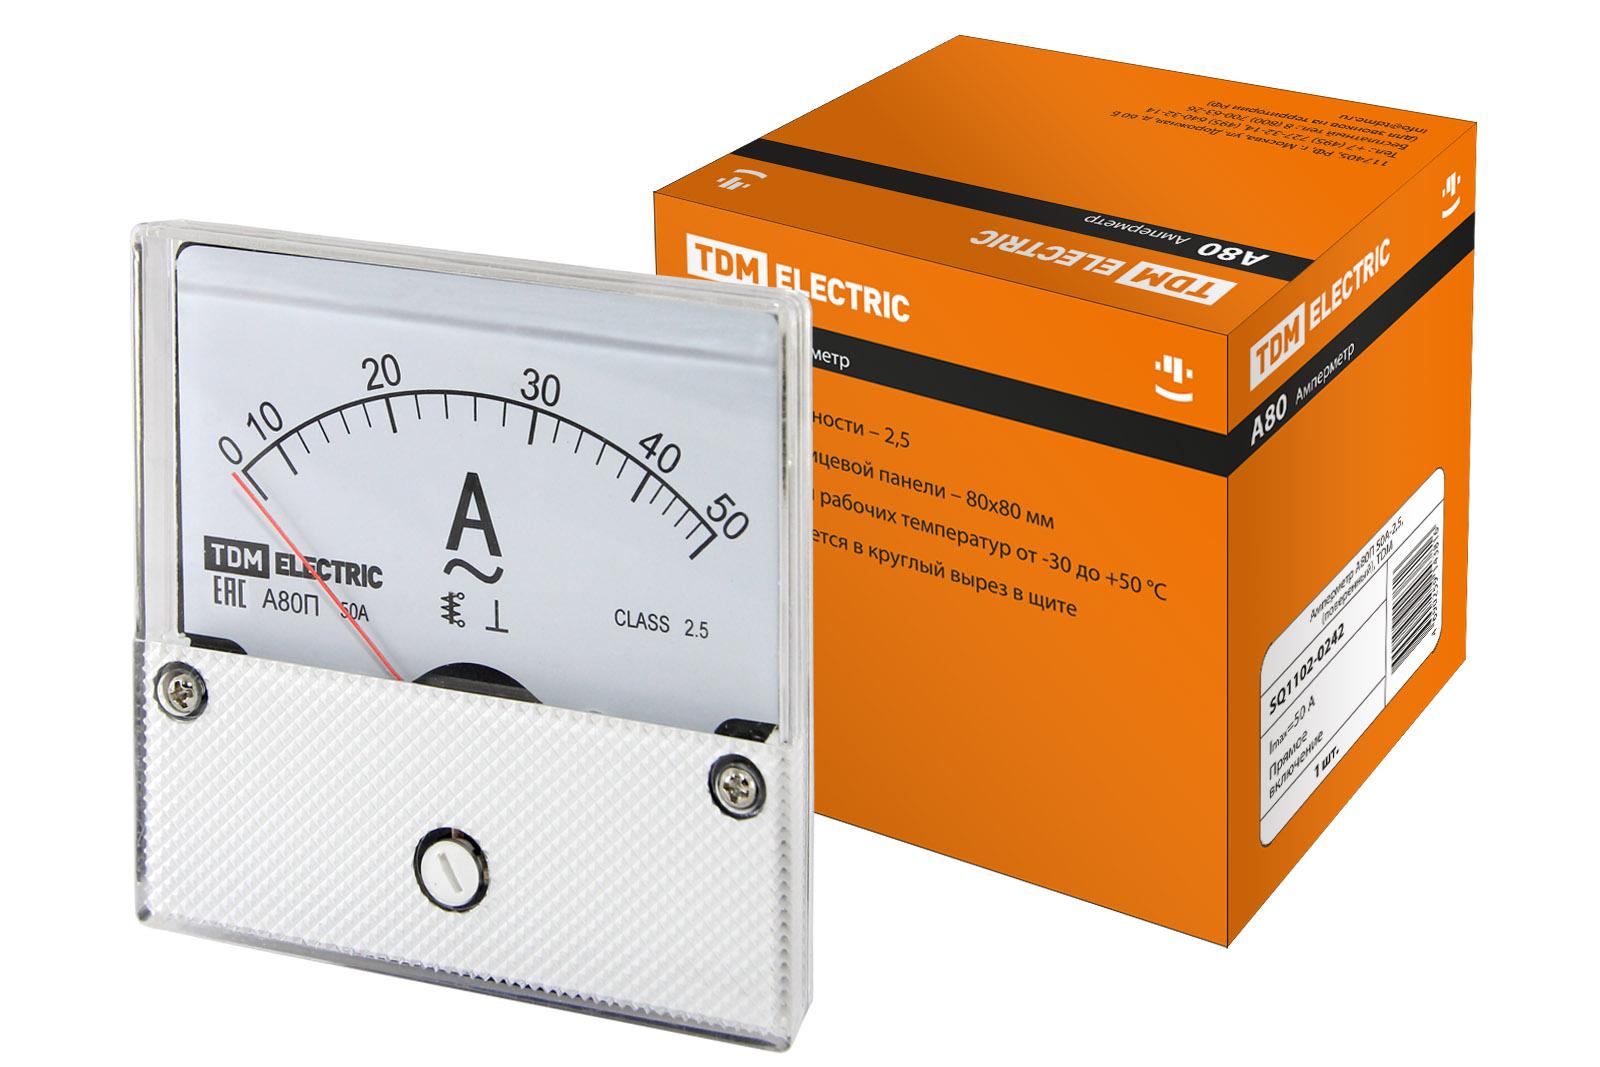 Амперметр А80П 50А-2,5, прямого включения, (поверенный), TDM SQ1102-0242 TDM Electric